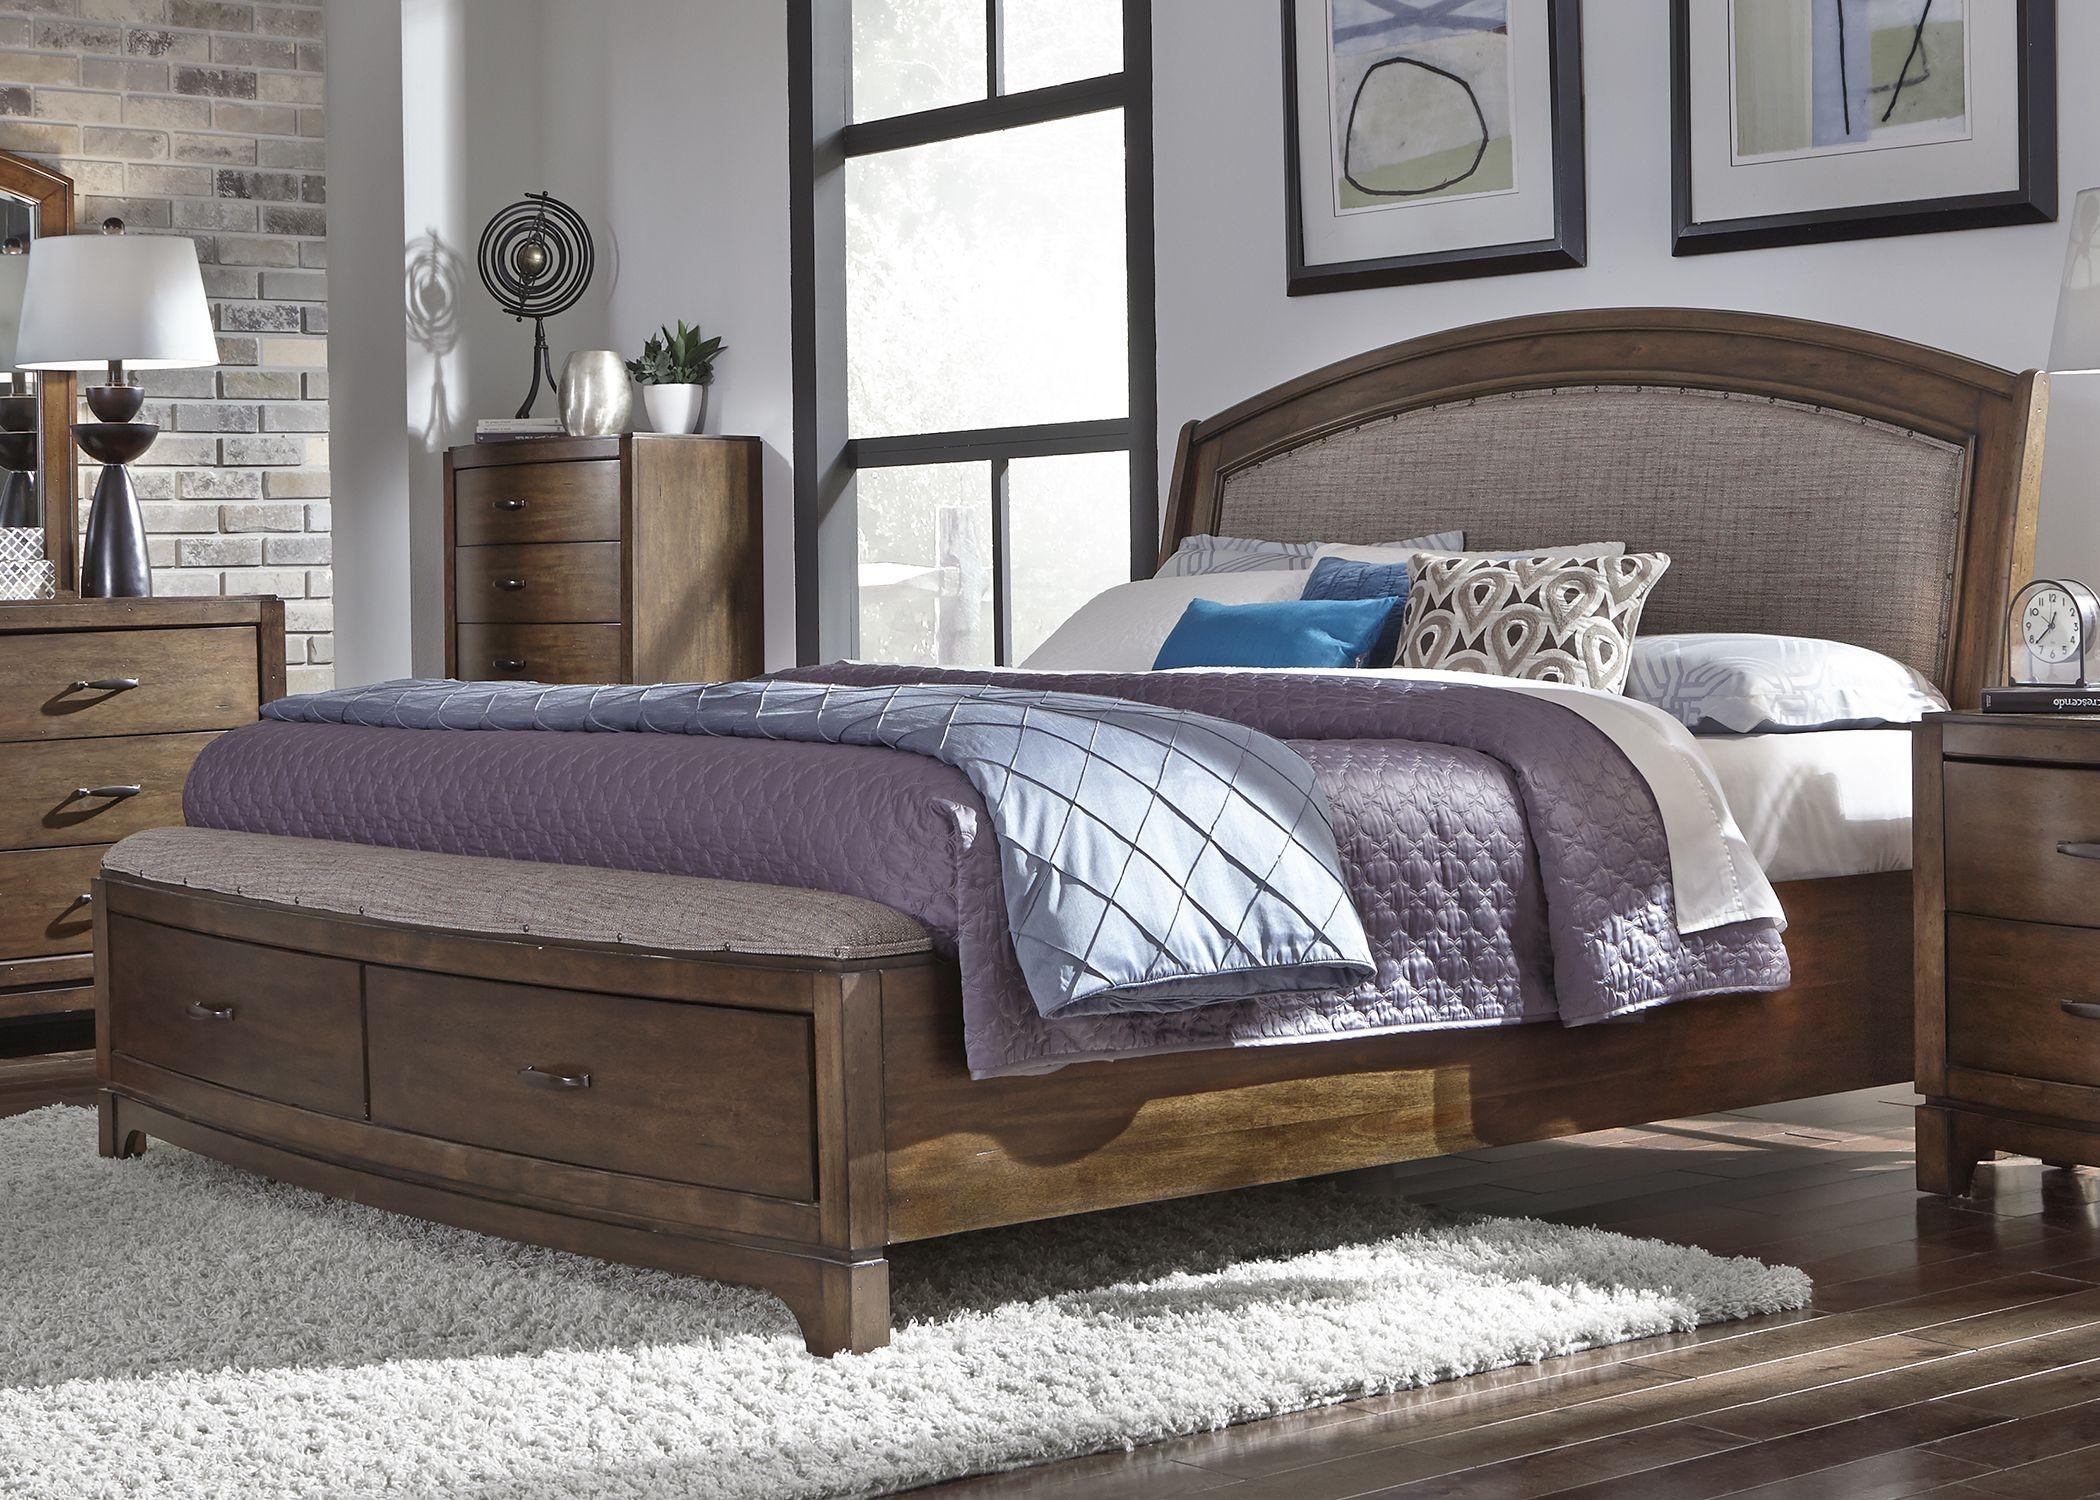 avalon iii pebble brown upholstered storage bedroom set from liberty coleman furniture. Black Bedroom Furniture Sets. Home Design Ideas